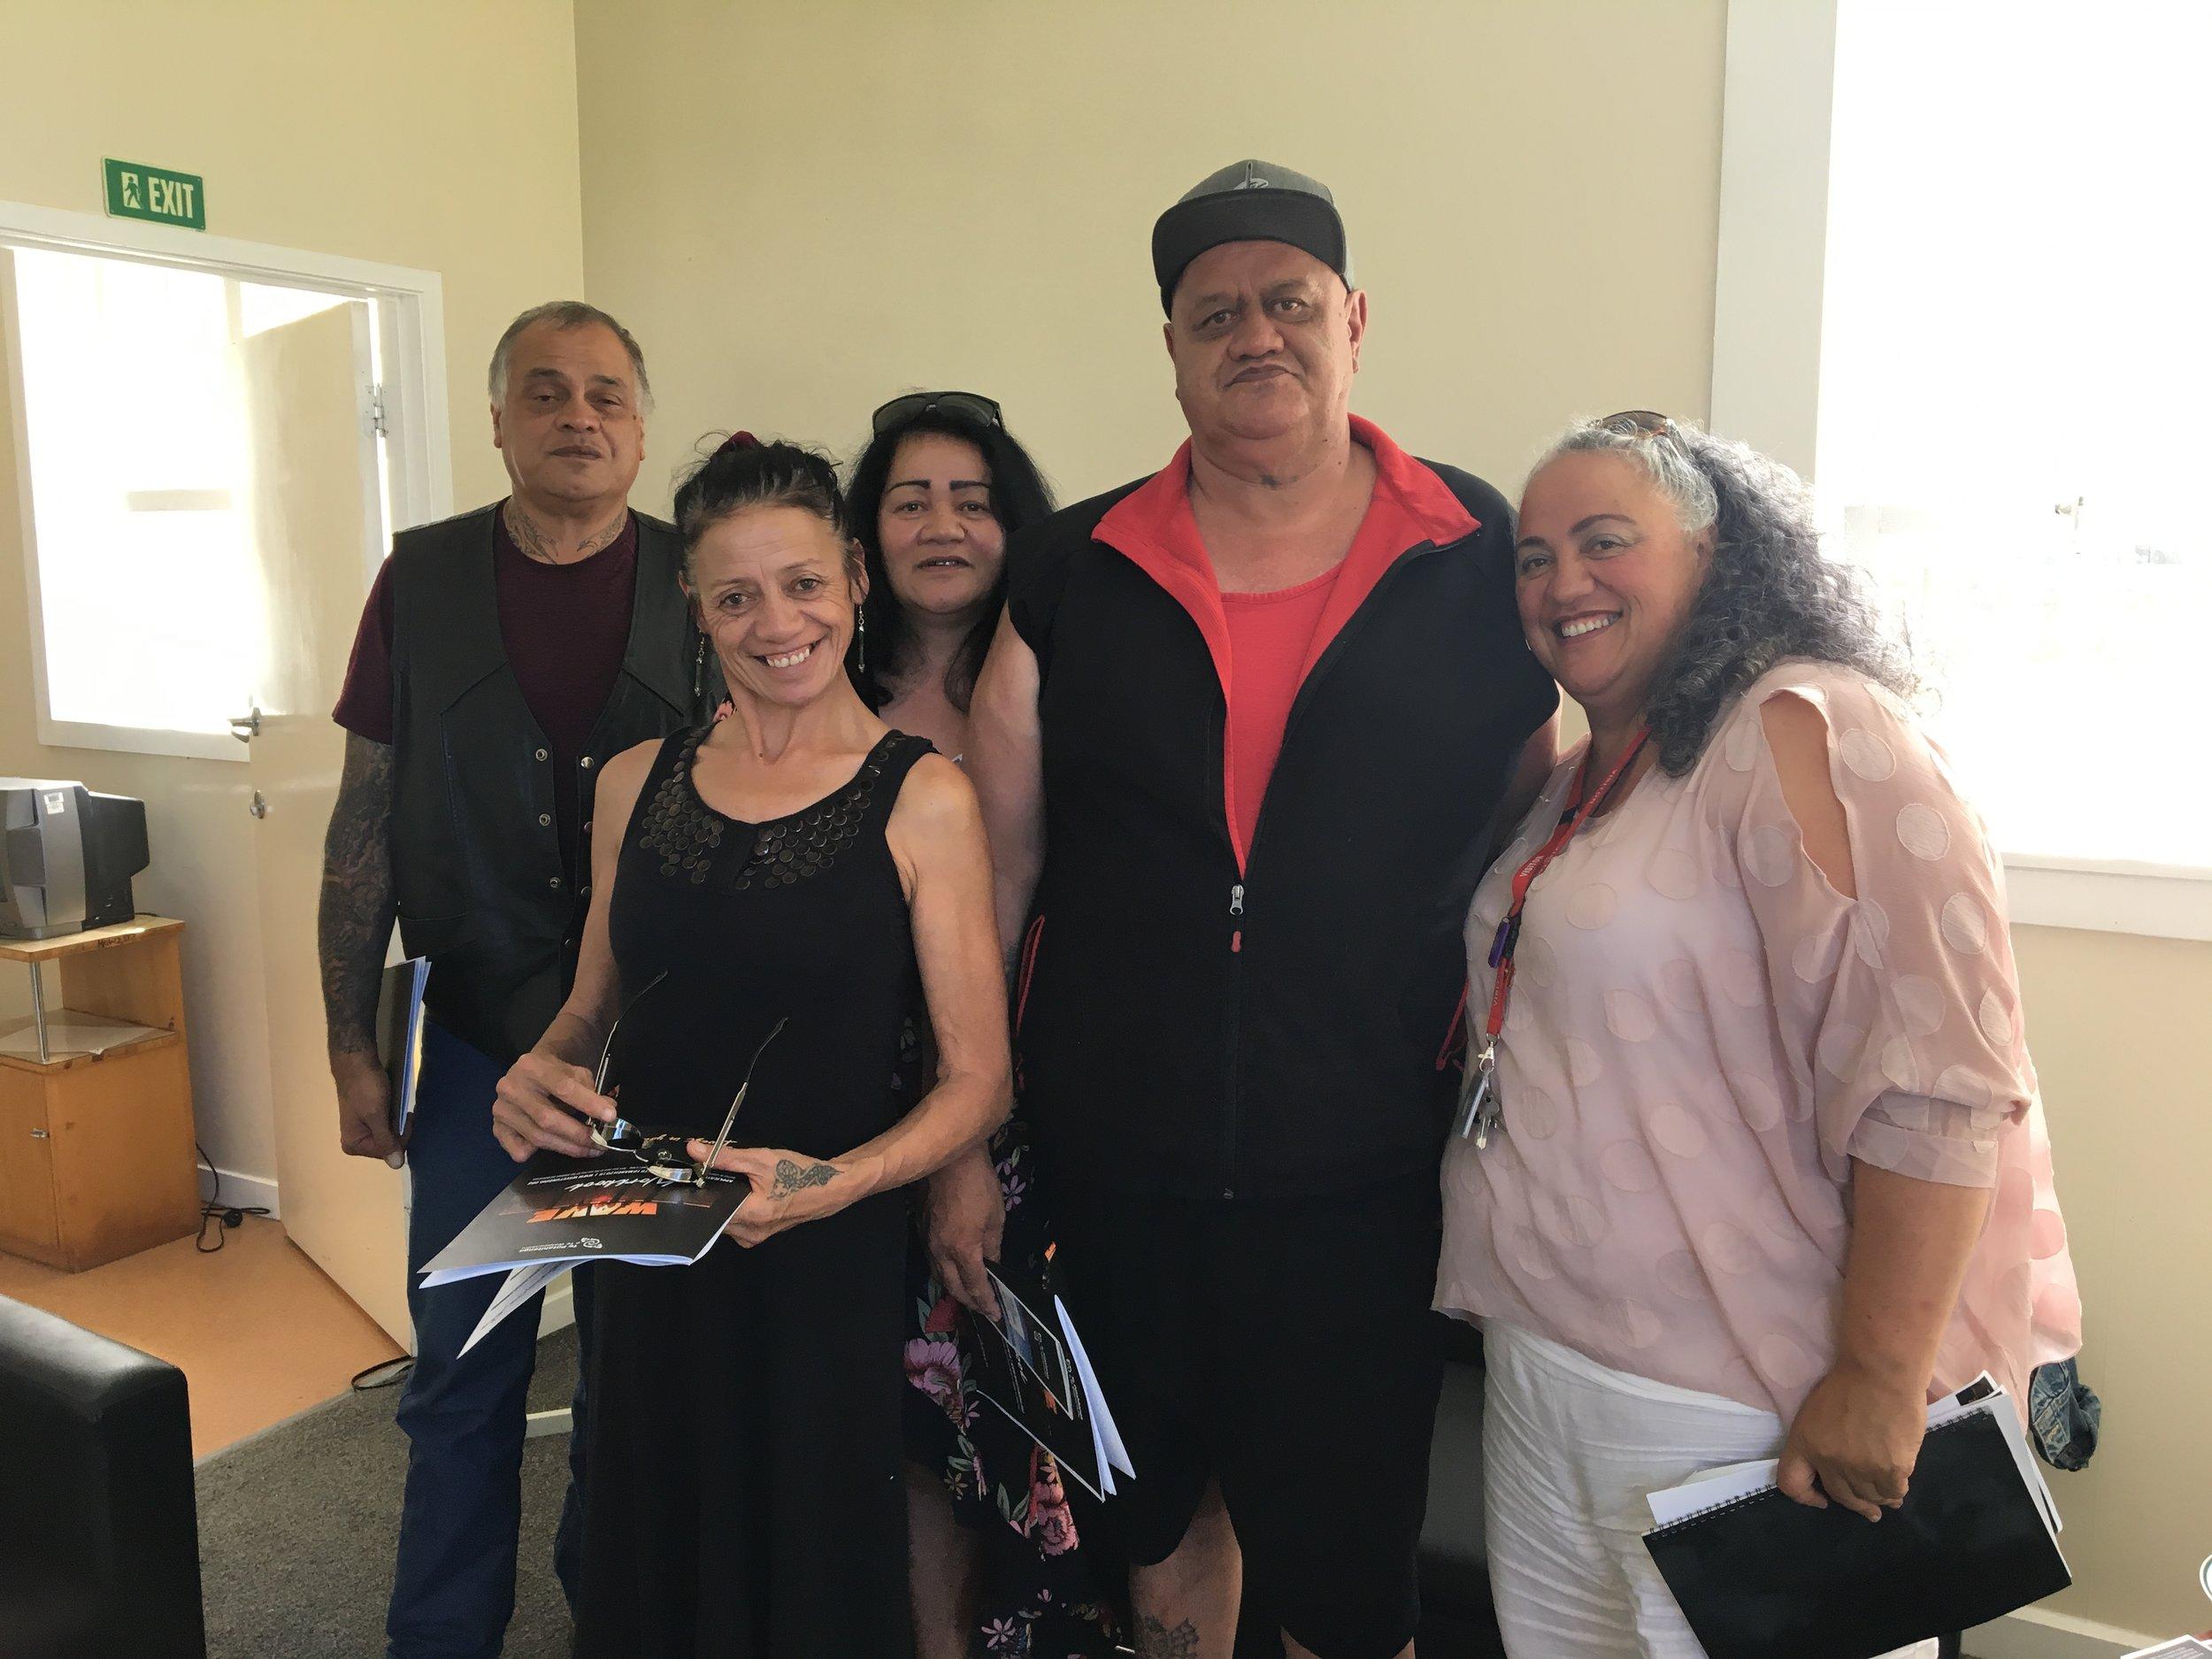 The McDonald whānau at the Wave Nine workshop in Westport: Wayne, Anituhia, Donna, Russell, Rehia